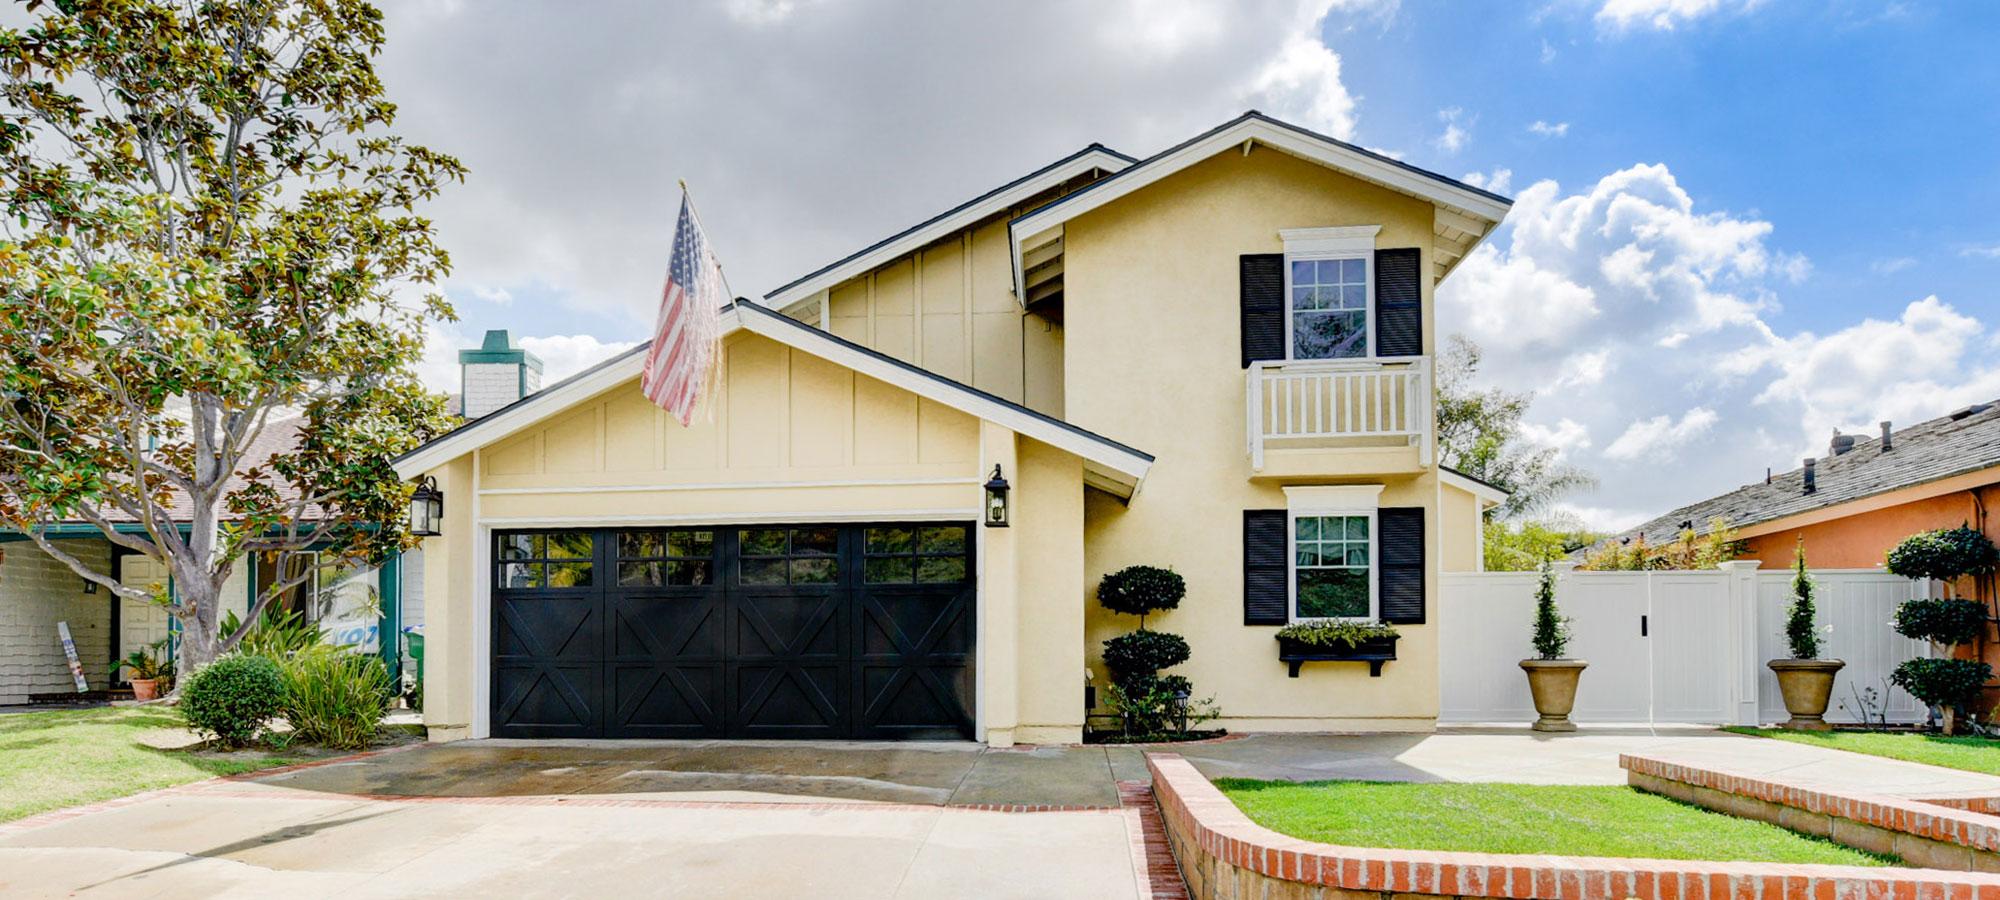 22042 Bacalar, Mission Viejo, CA 92691